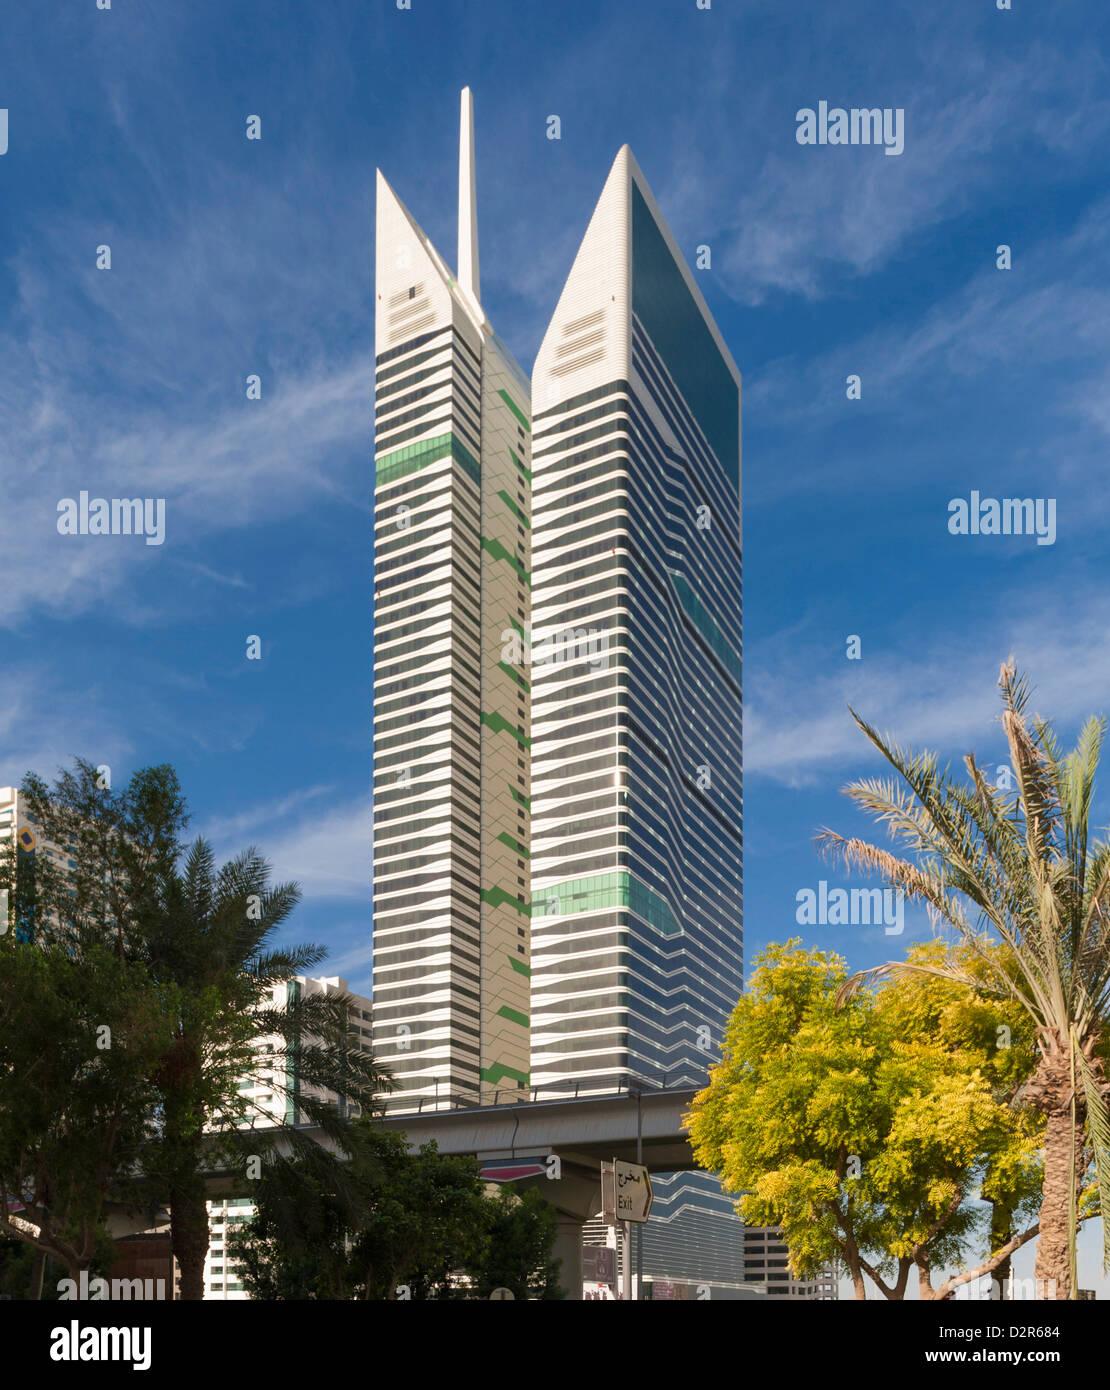 Radisson Royal Hotel, Dubai - Stock Image